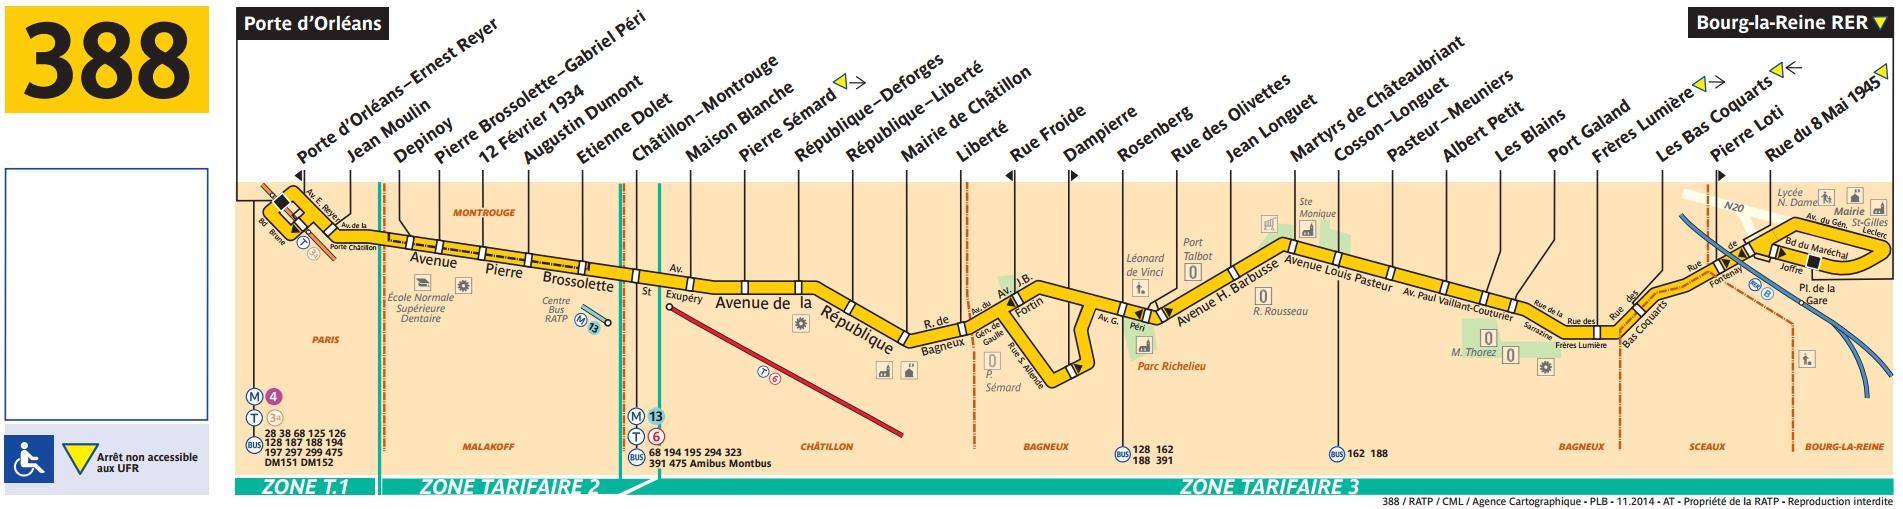 Plan bus Ligne 388